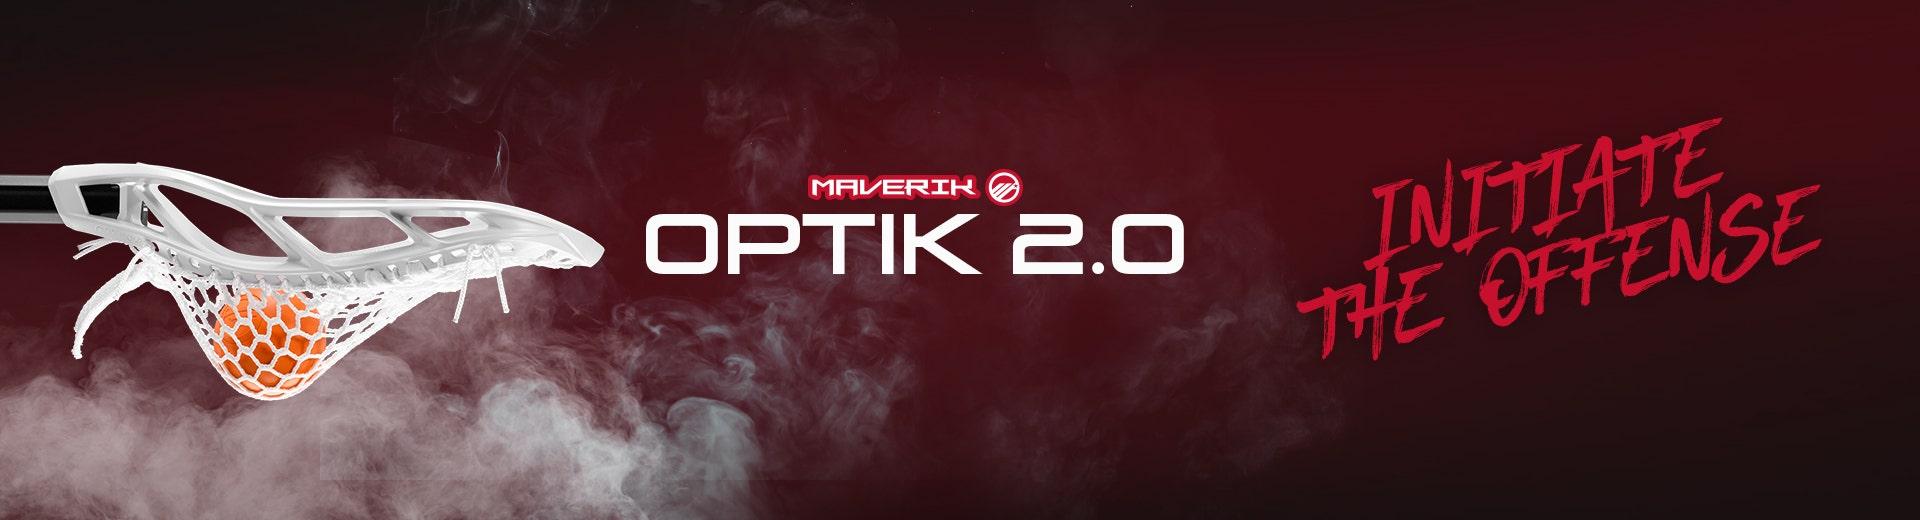 Maverik Optik 2.0 - Desktop